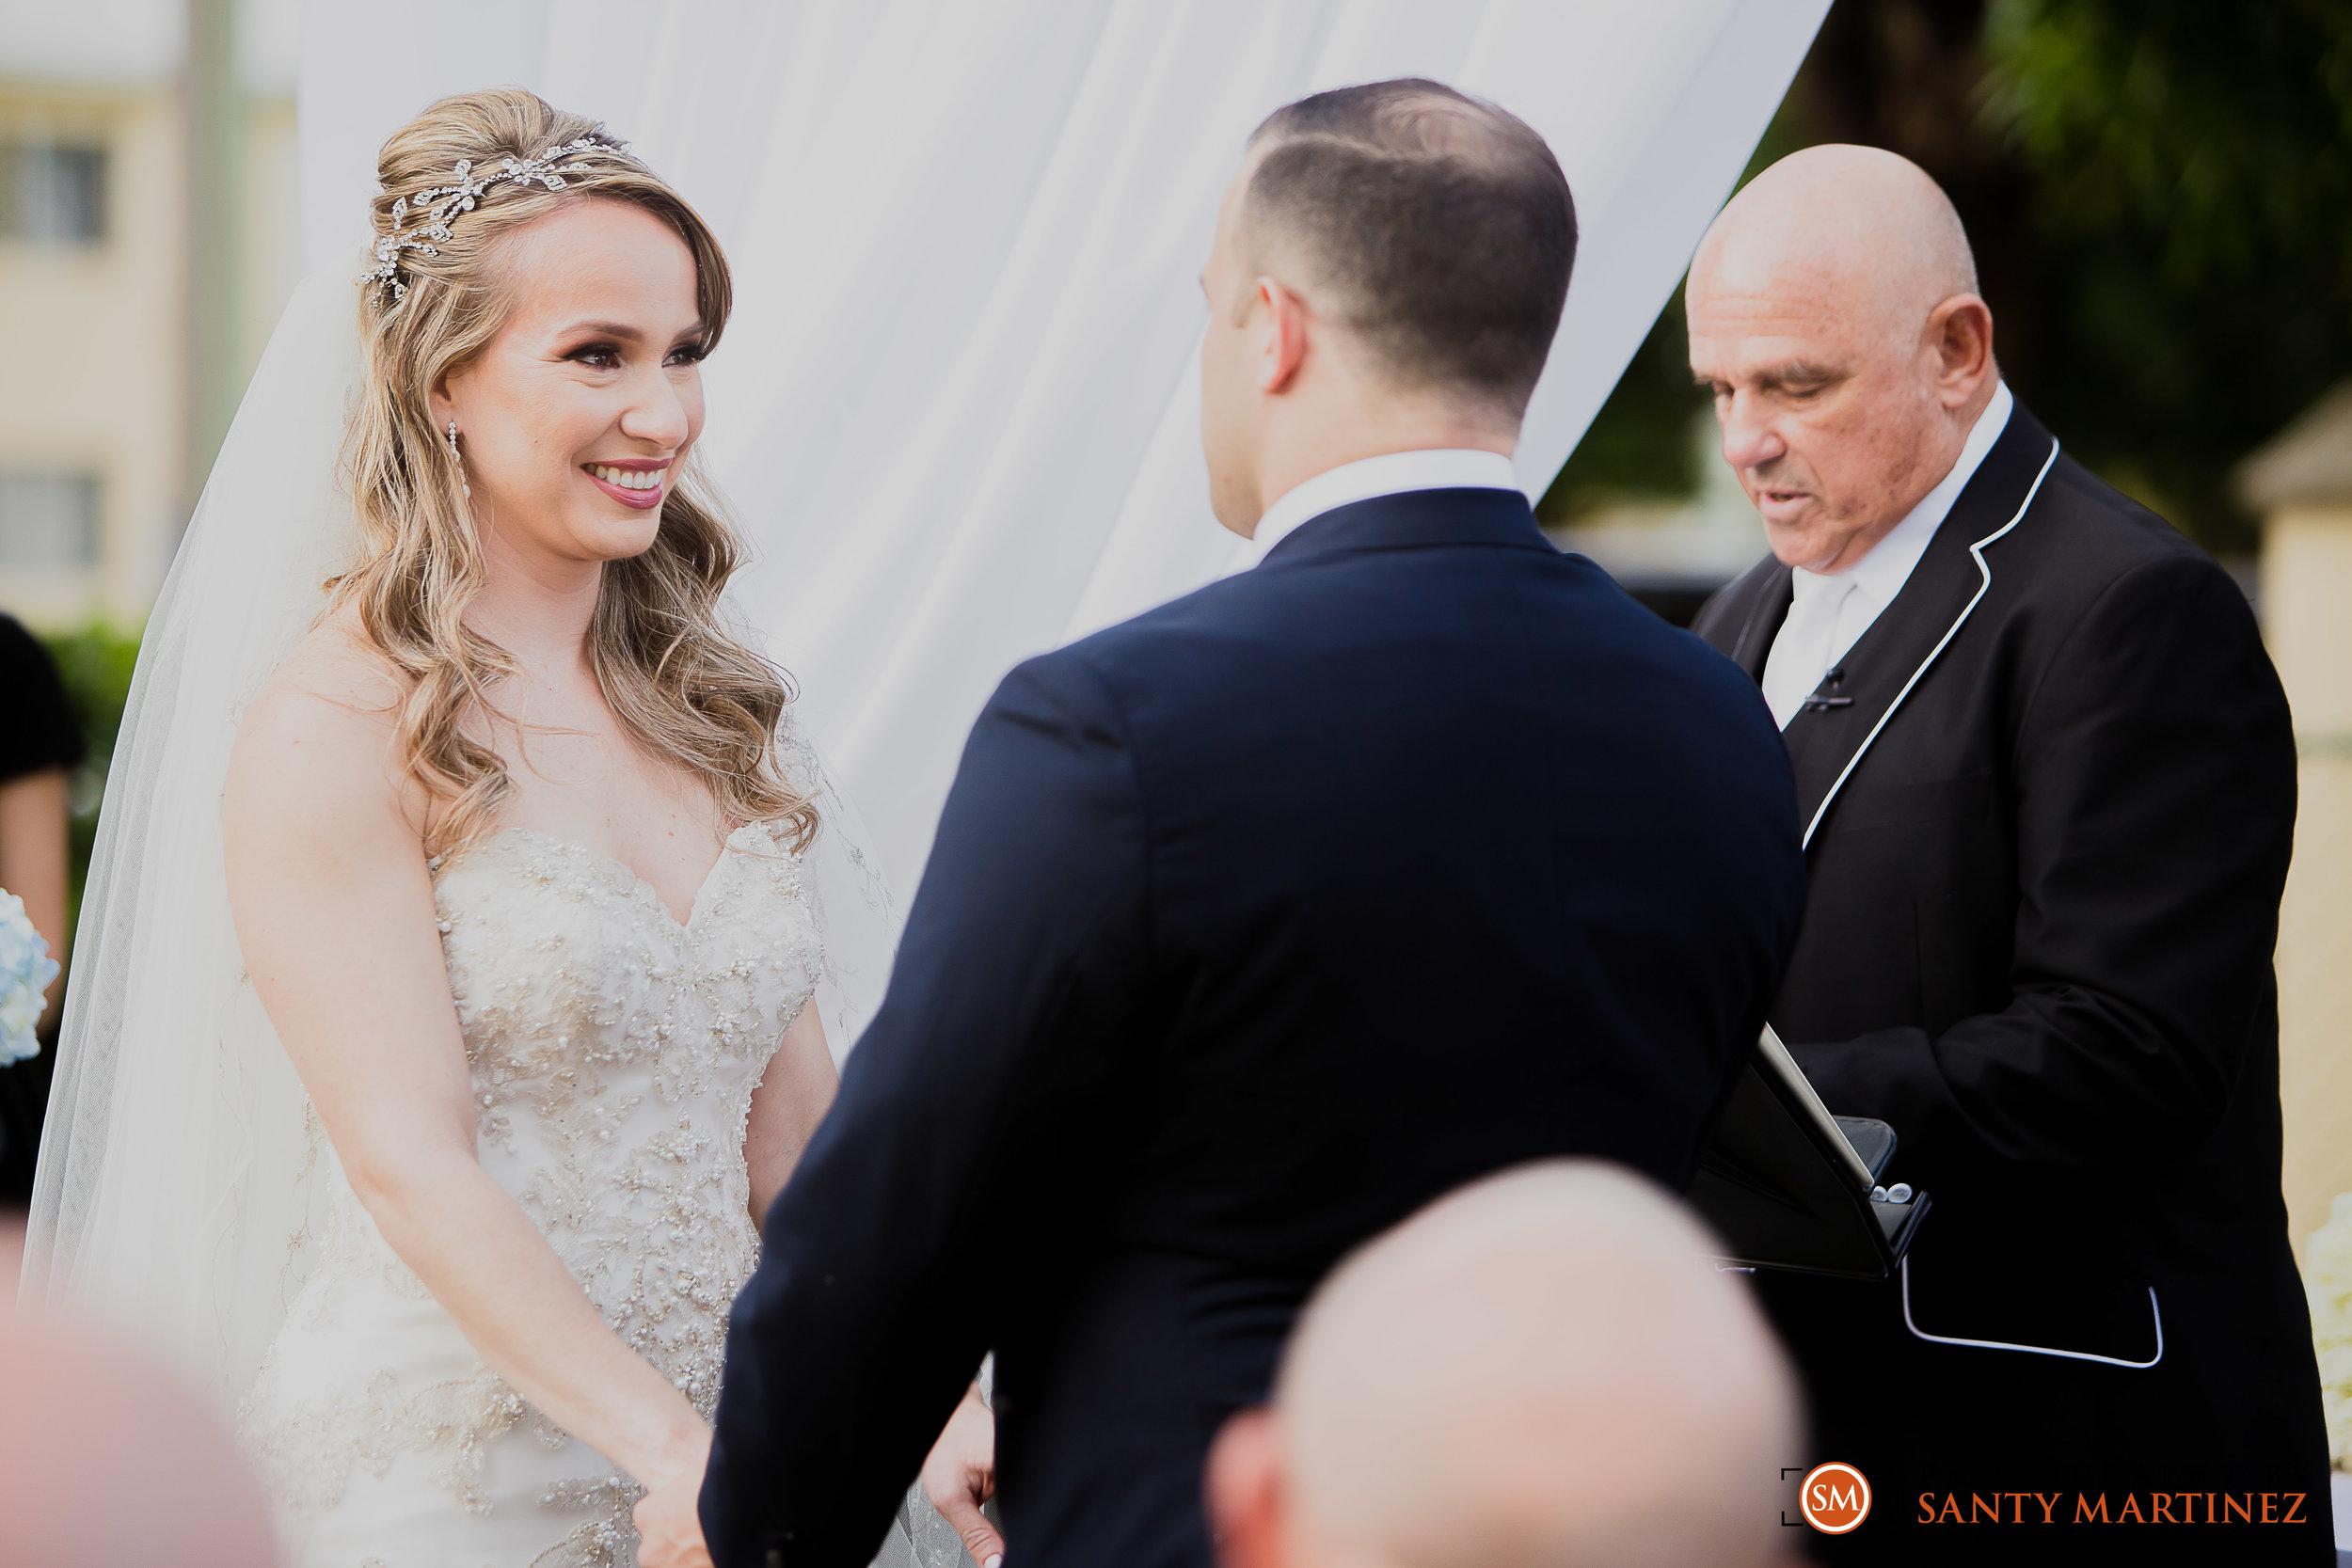 Wedding La Jolla Ballroom - Photography by Santy Martinez-31.jpg